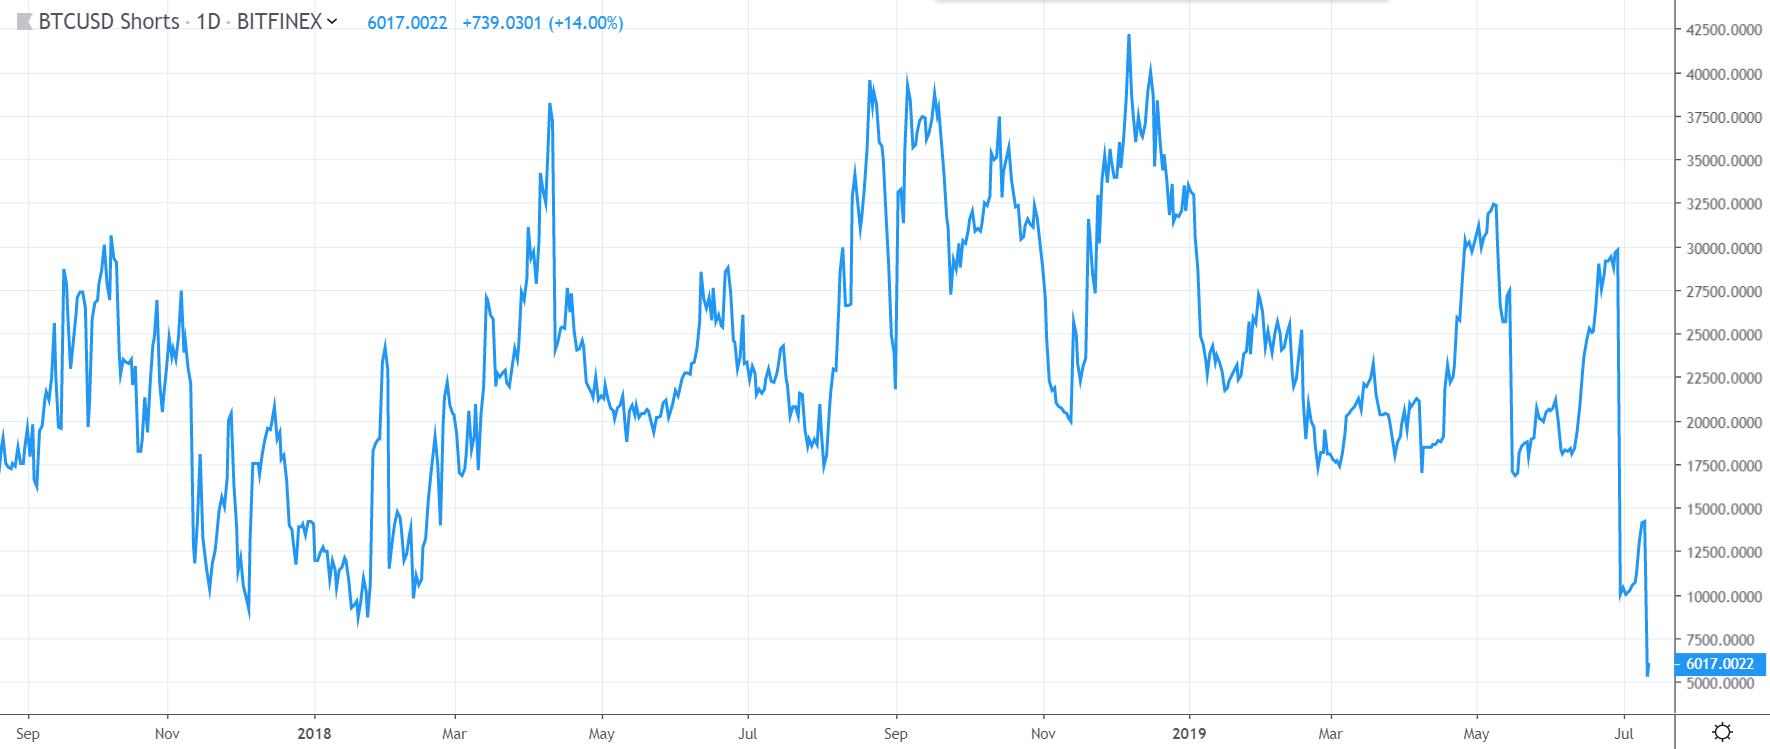 market, cryptocurrency, crypto, bitcoin, blockchain, ethereum, trading, economy